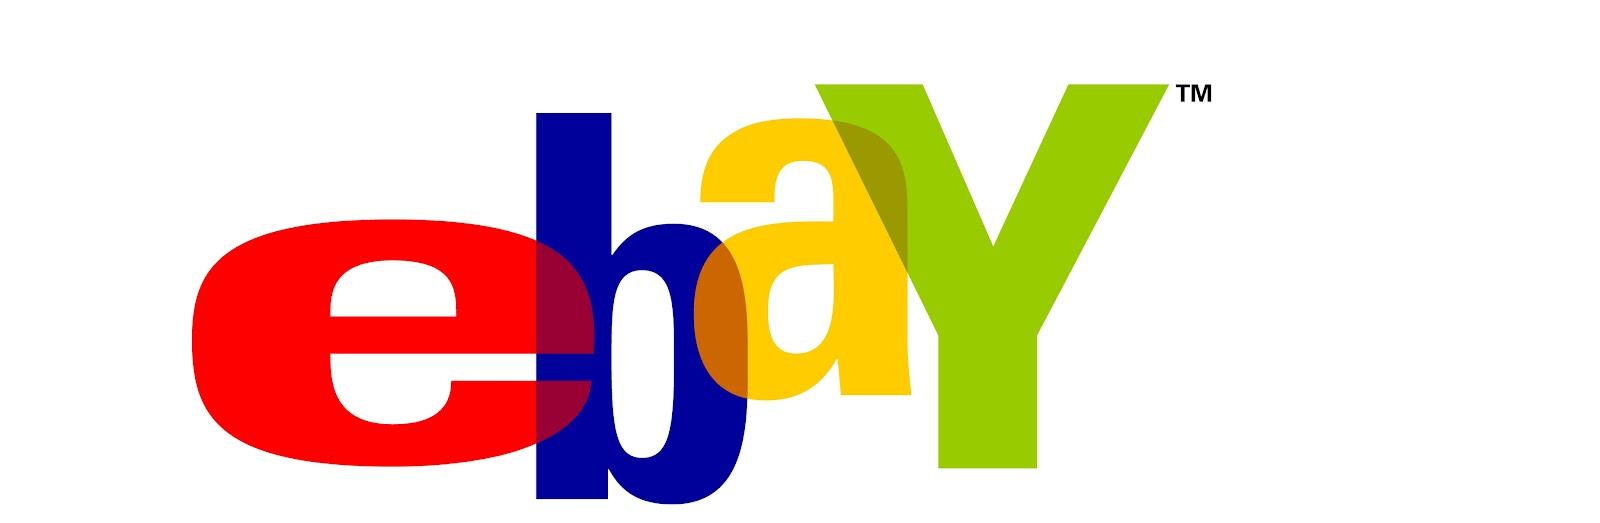 An Aside Selling High Ticket Items On Ebay Has Huge Risk Stockguru Market Alerts